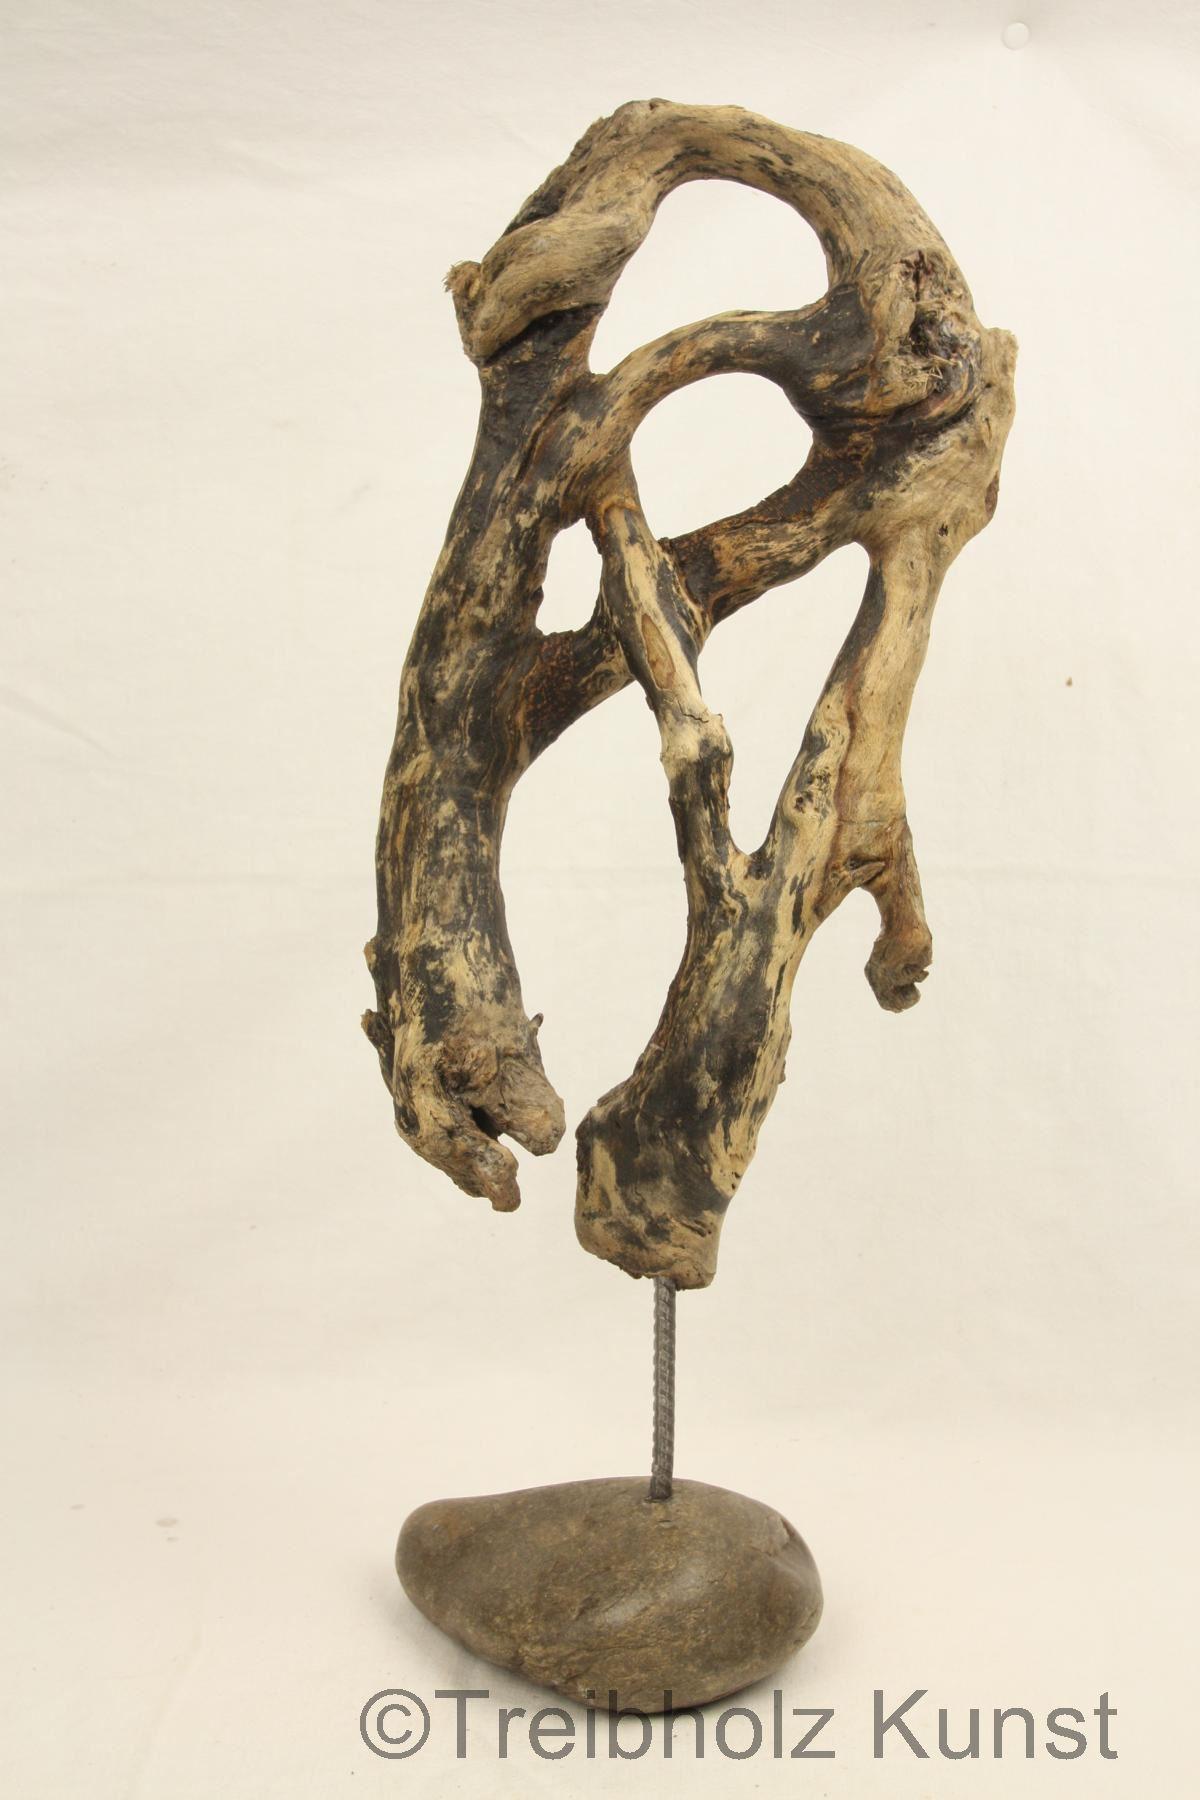 Treibholz Skulpturen Wwwtreibholz Bodenseede Schwemmholz